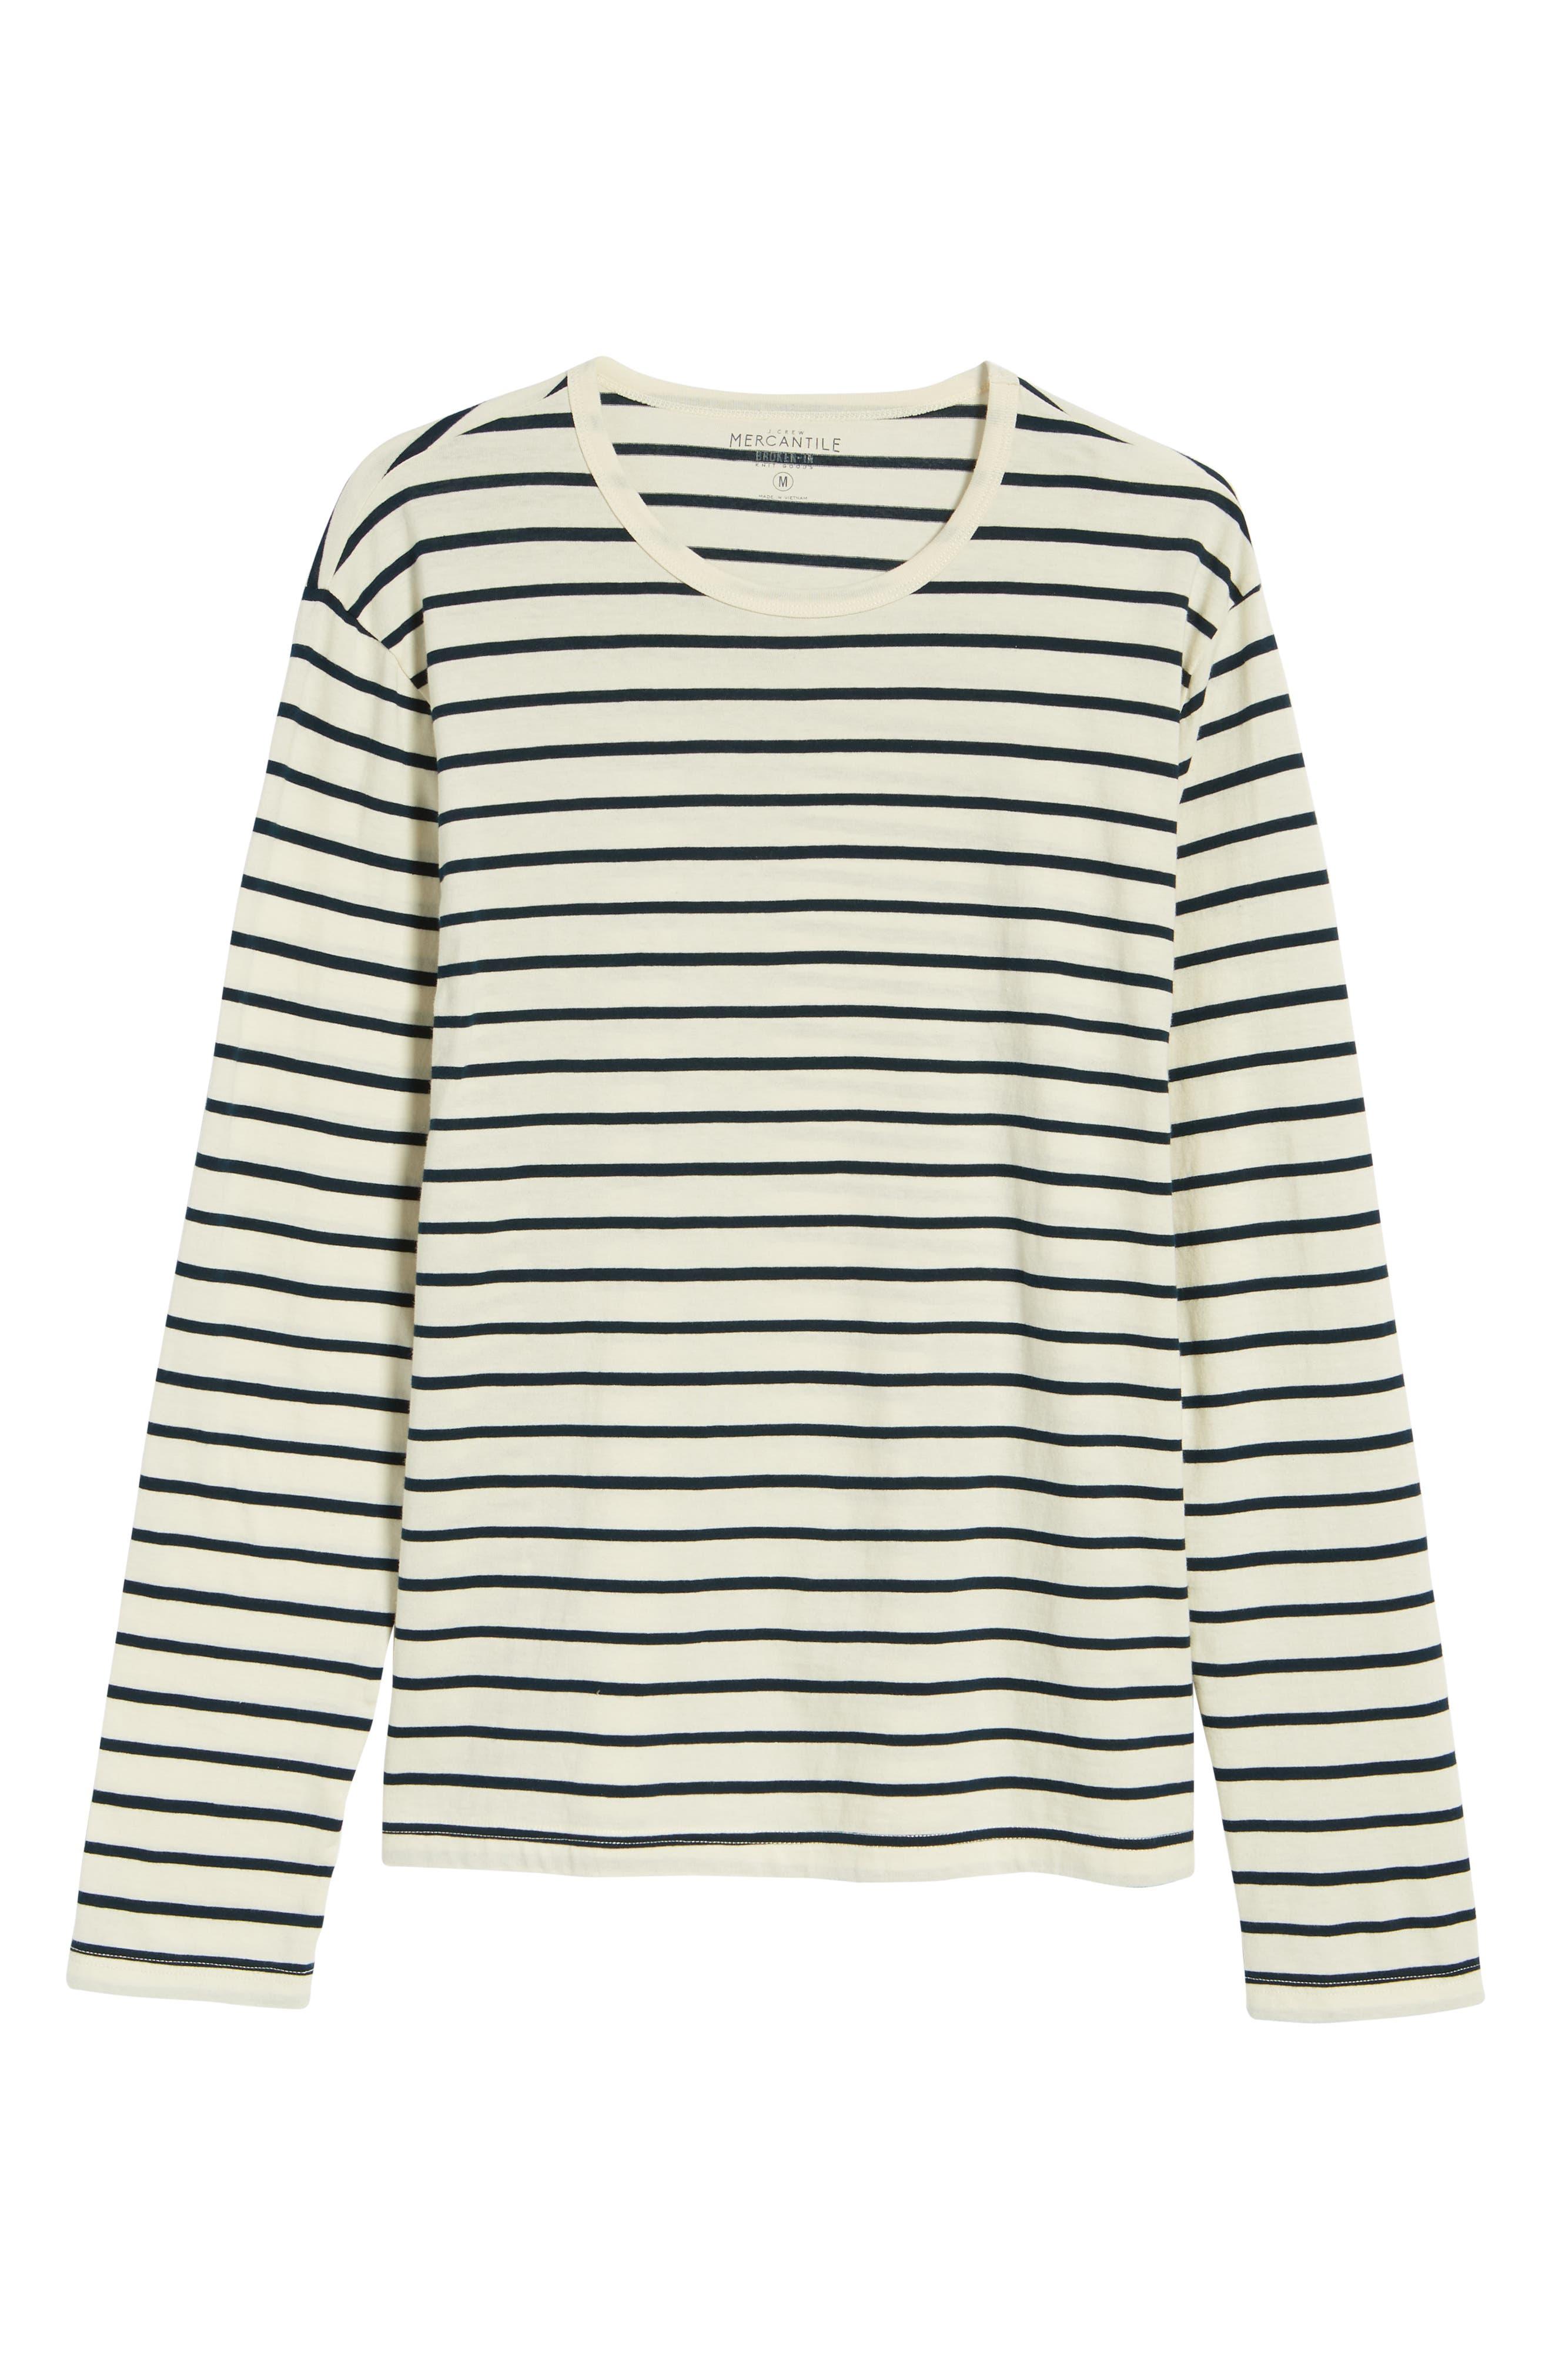 Mercantile Stripe Long Sleeve T-Shirt,                             Alternate thumbnail 6, color,                             100